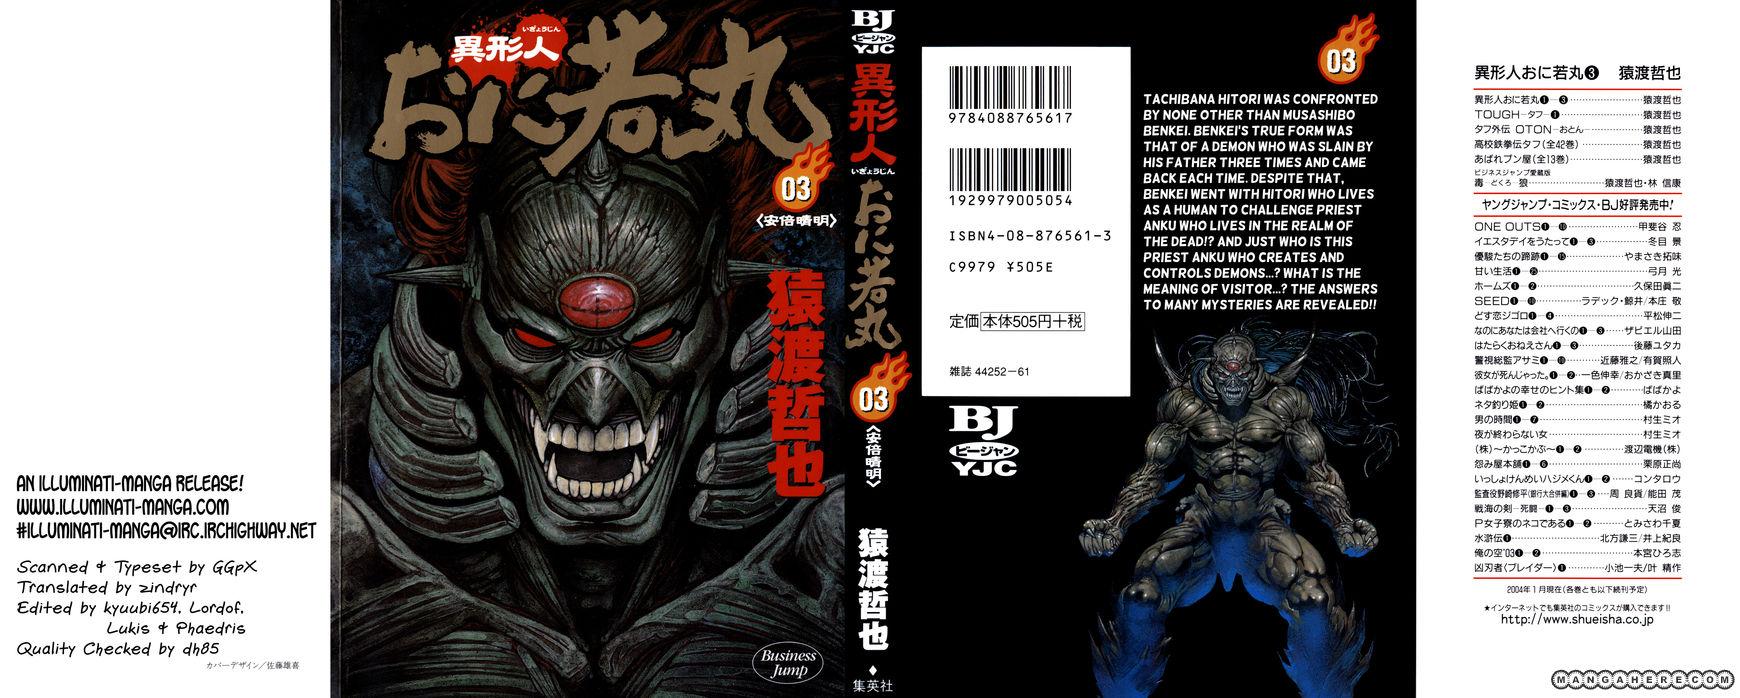 Igyoujin Oniwakamaru 16 Page 1